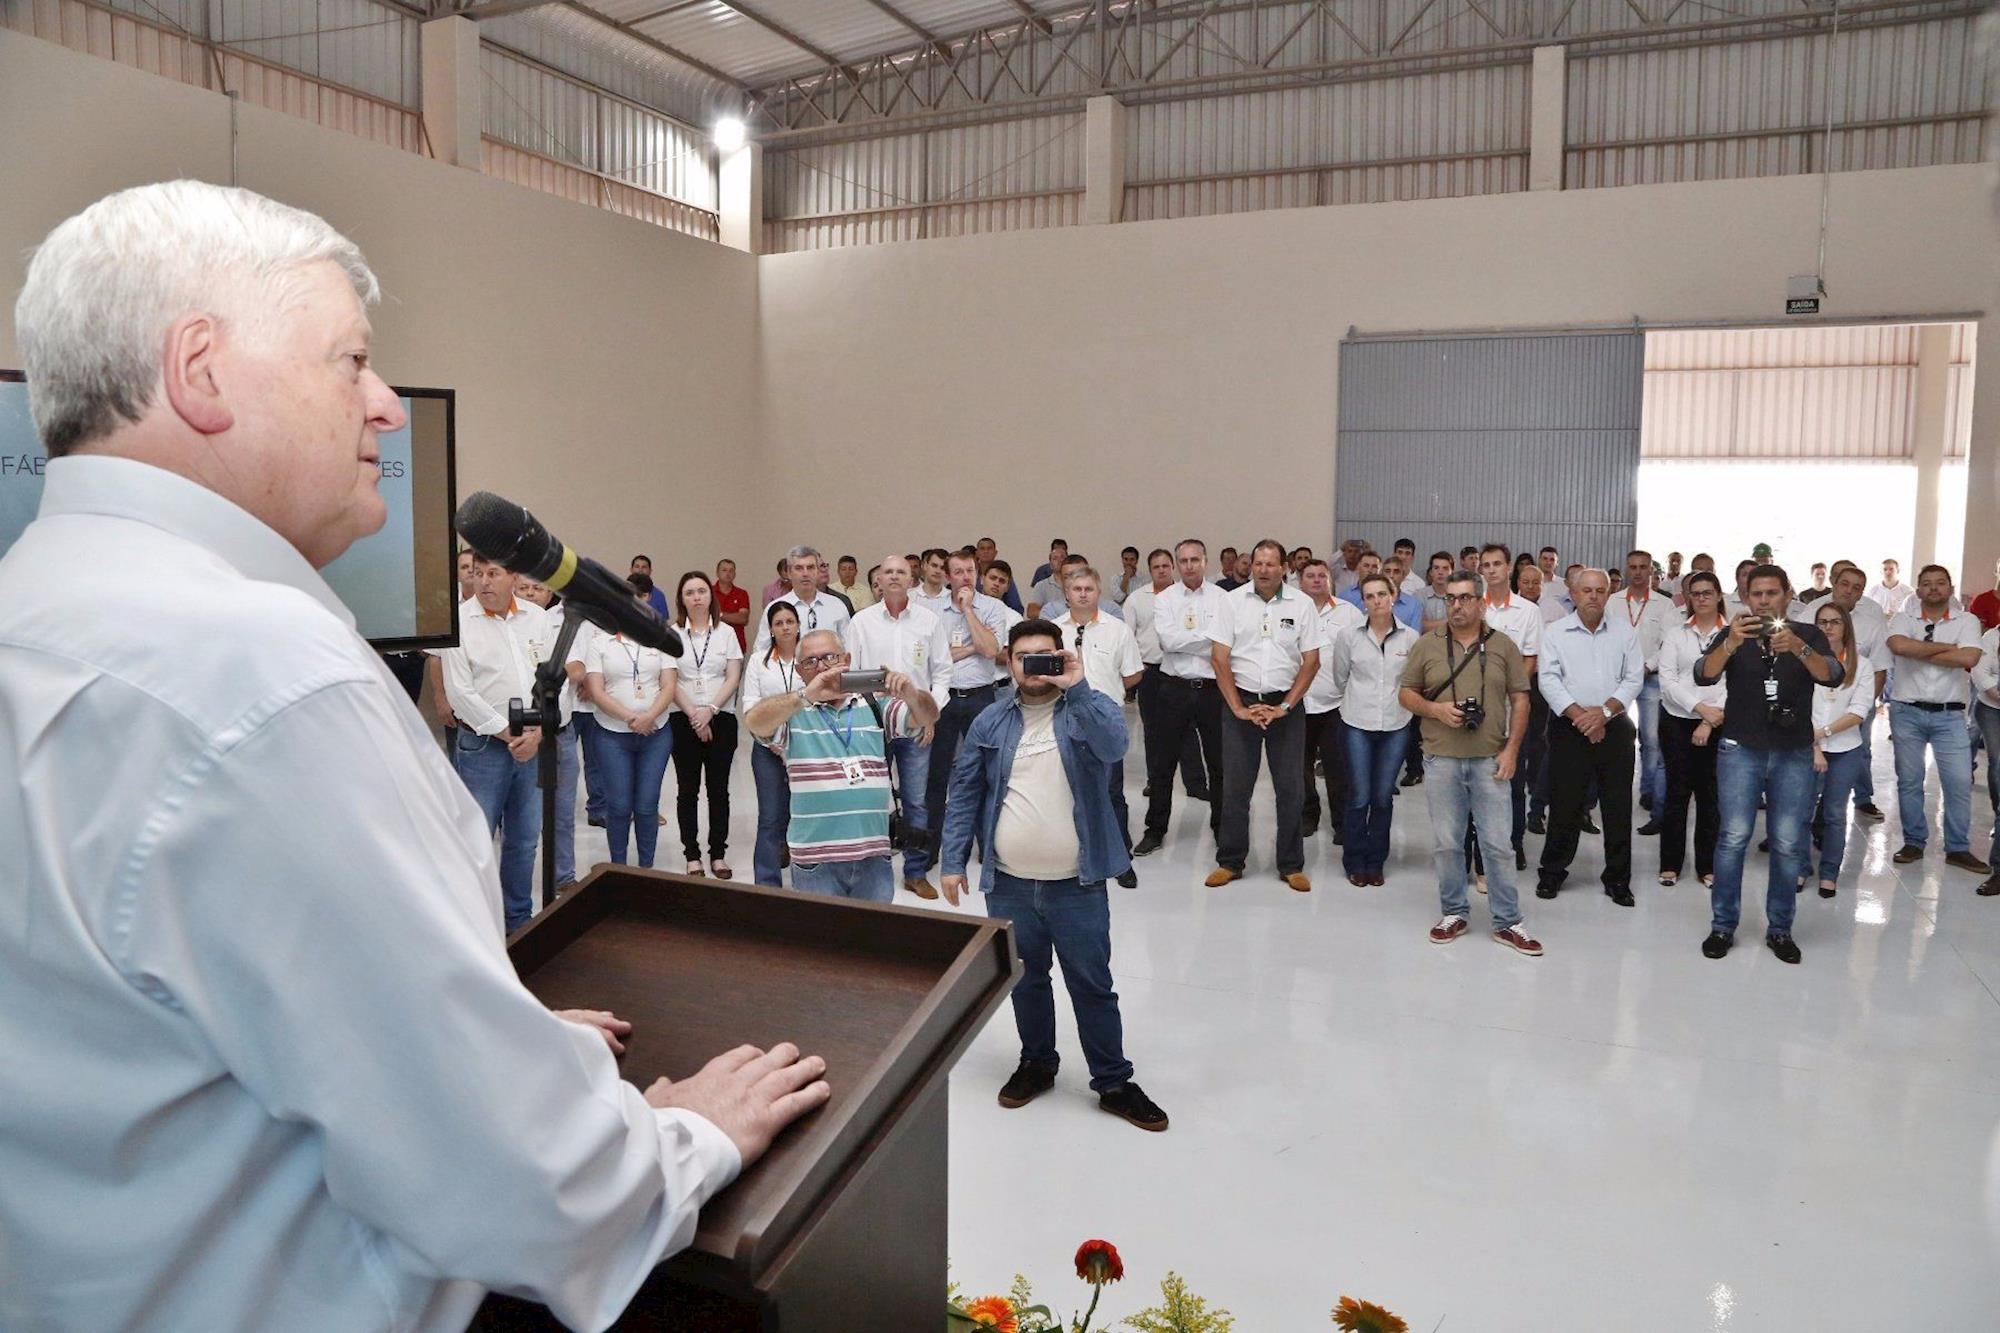 Cooperativa investe R$ 40 mi em fábricas de rações para matrizes e premix, Cooperativa investe R$ 40 mi em fábricas de rações para matrizes e premix